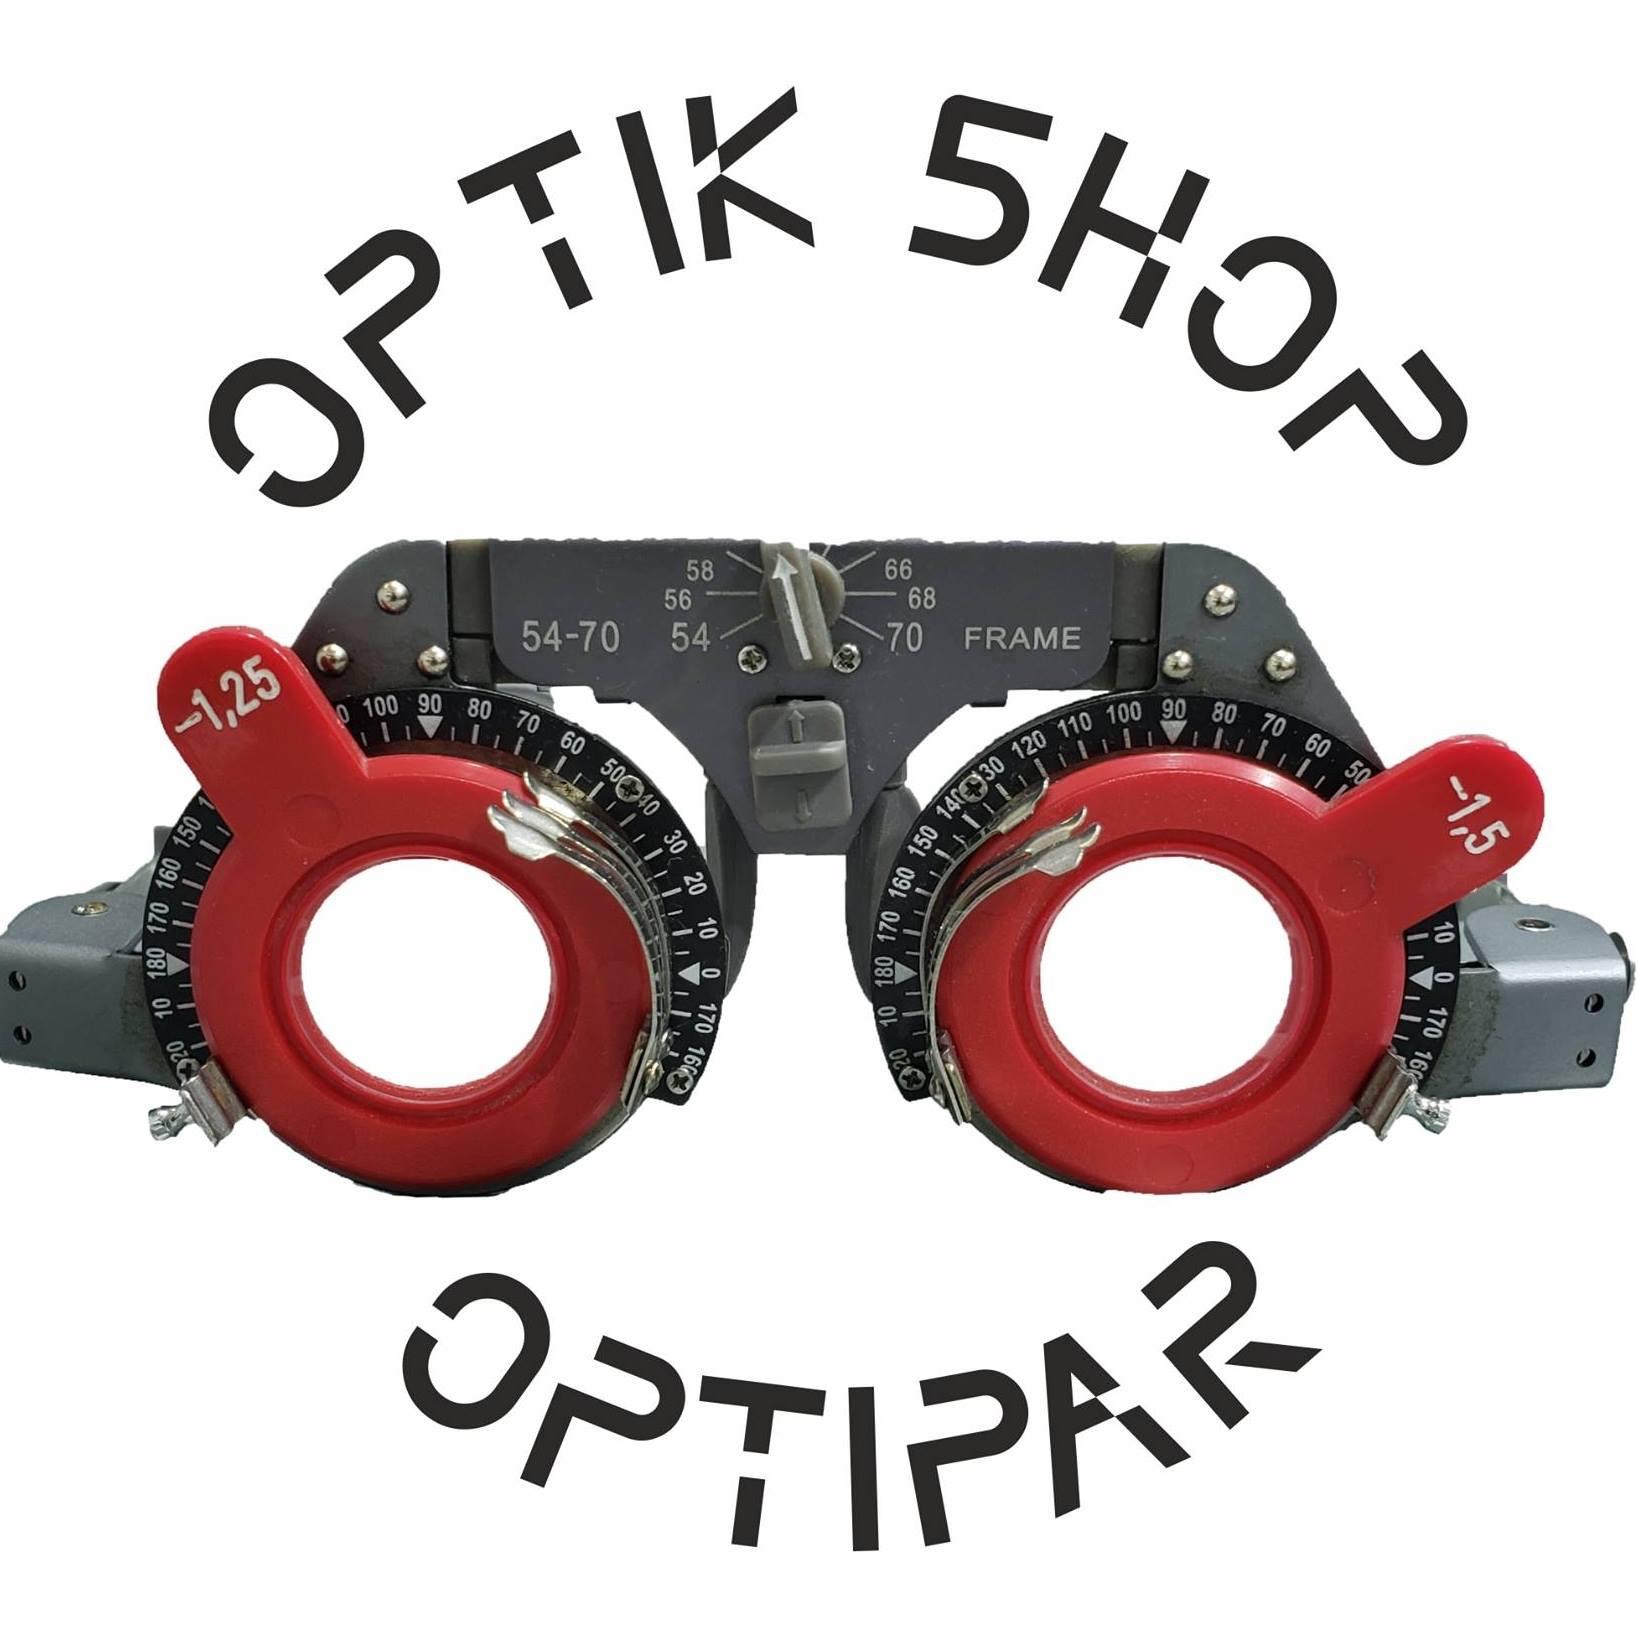 OPTIPAR – Optica medicala – ochelari, rame, lentile, consultatii oftalmologice Cluj-Napoca